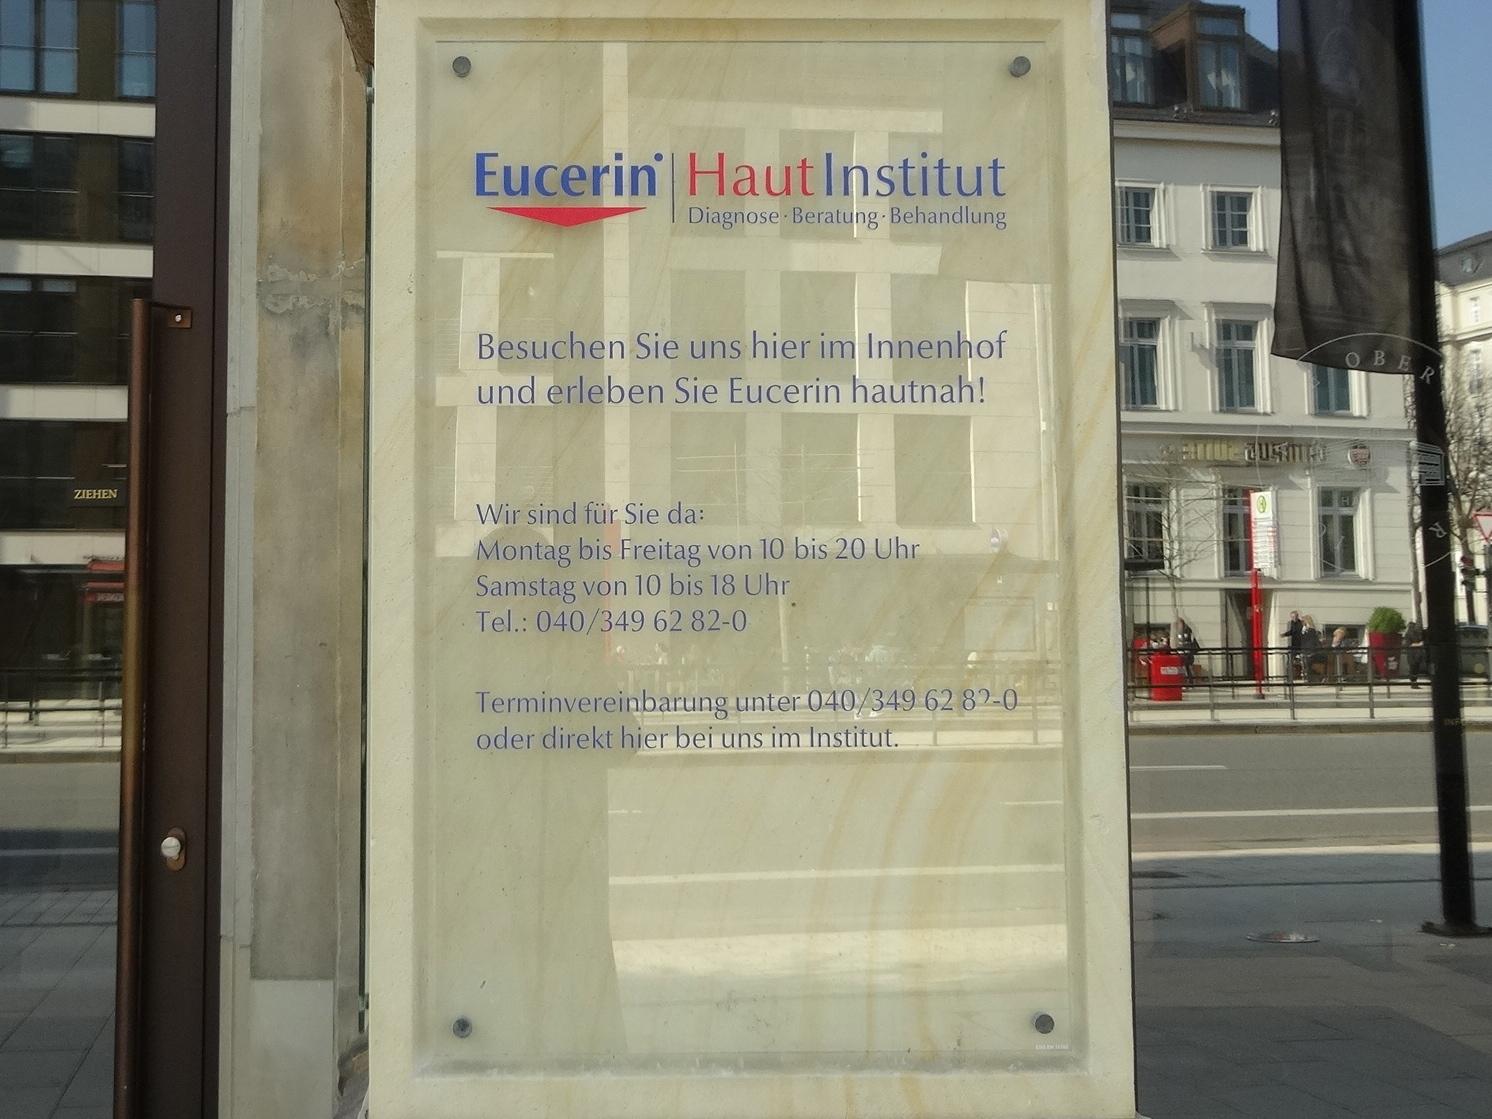 Eucerin Haut Institut Hamburg 1 HappyFace313